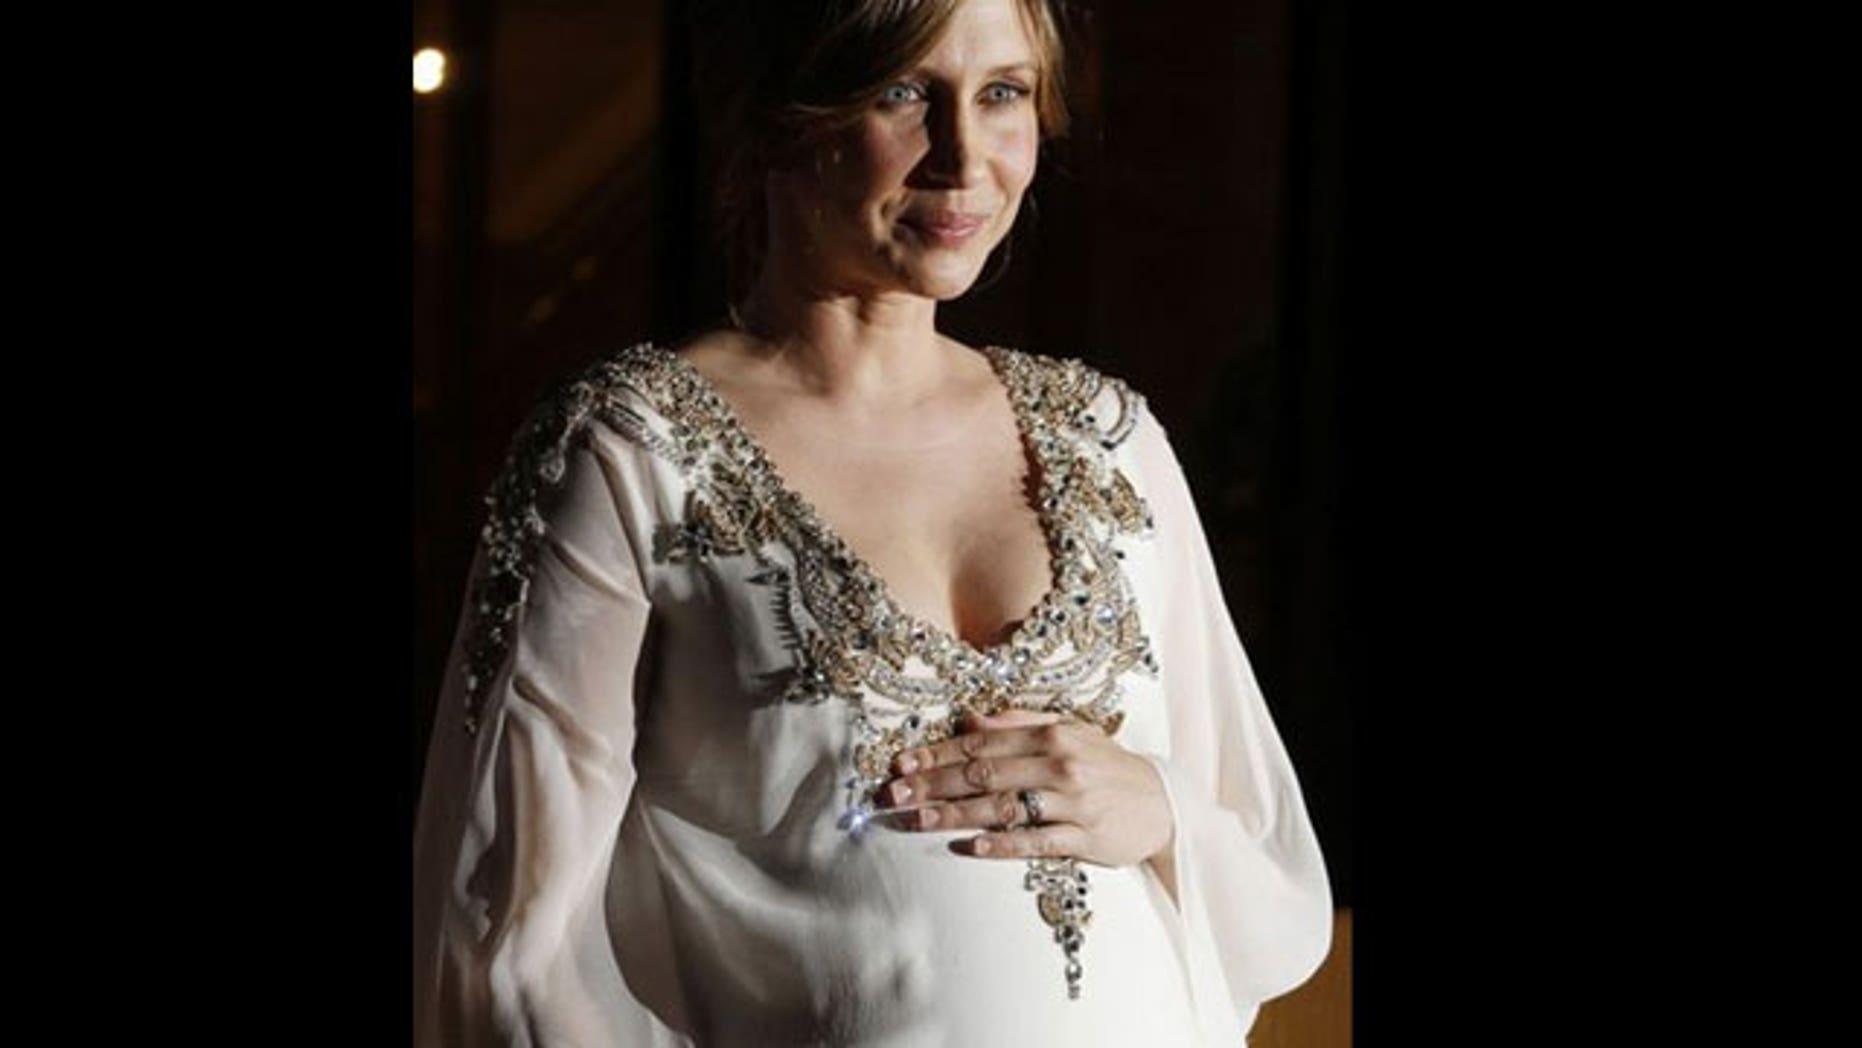 Is Vera Farmiga the hottest expectant mom right now?